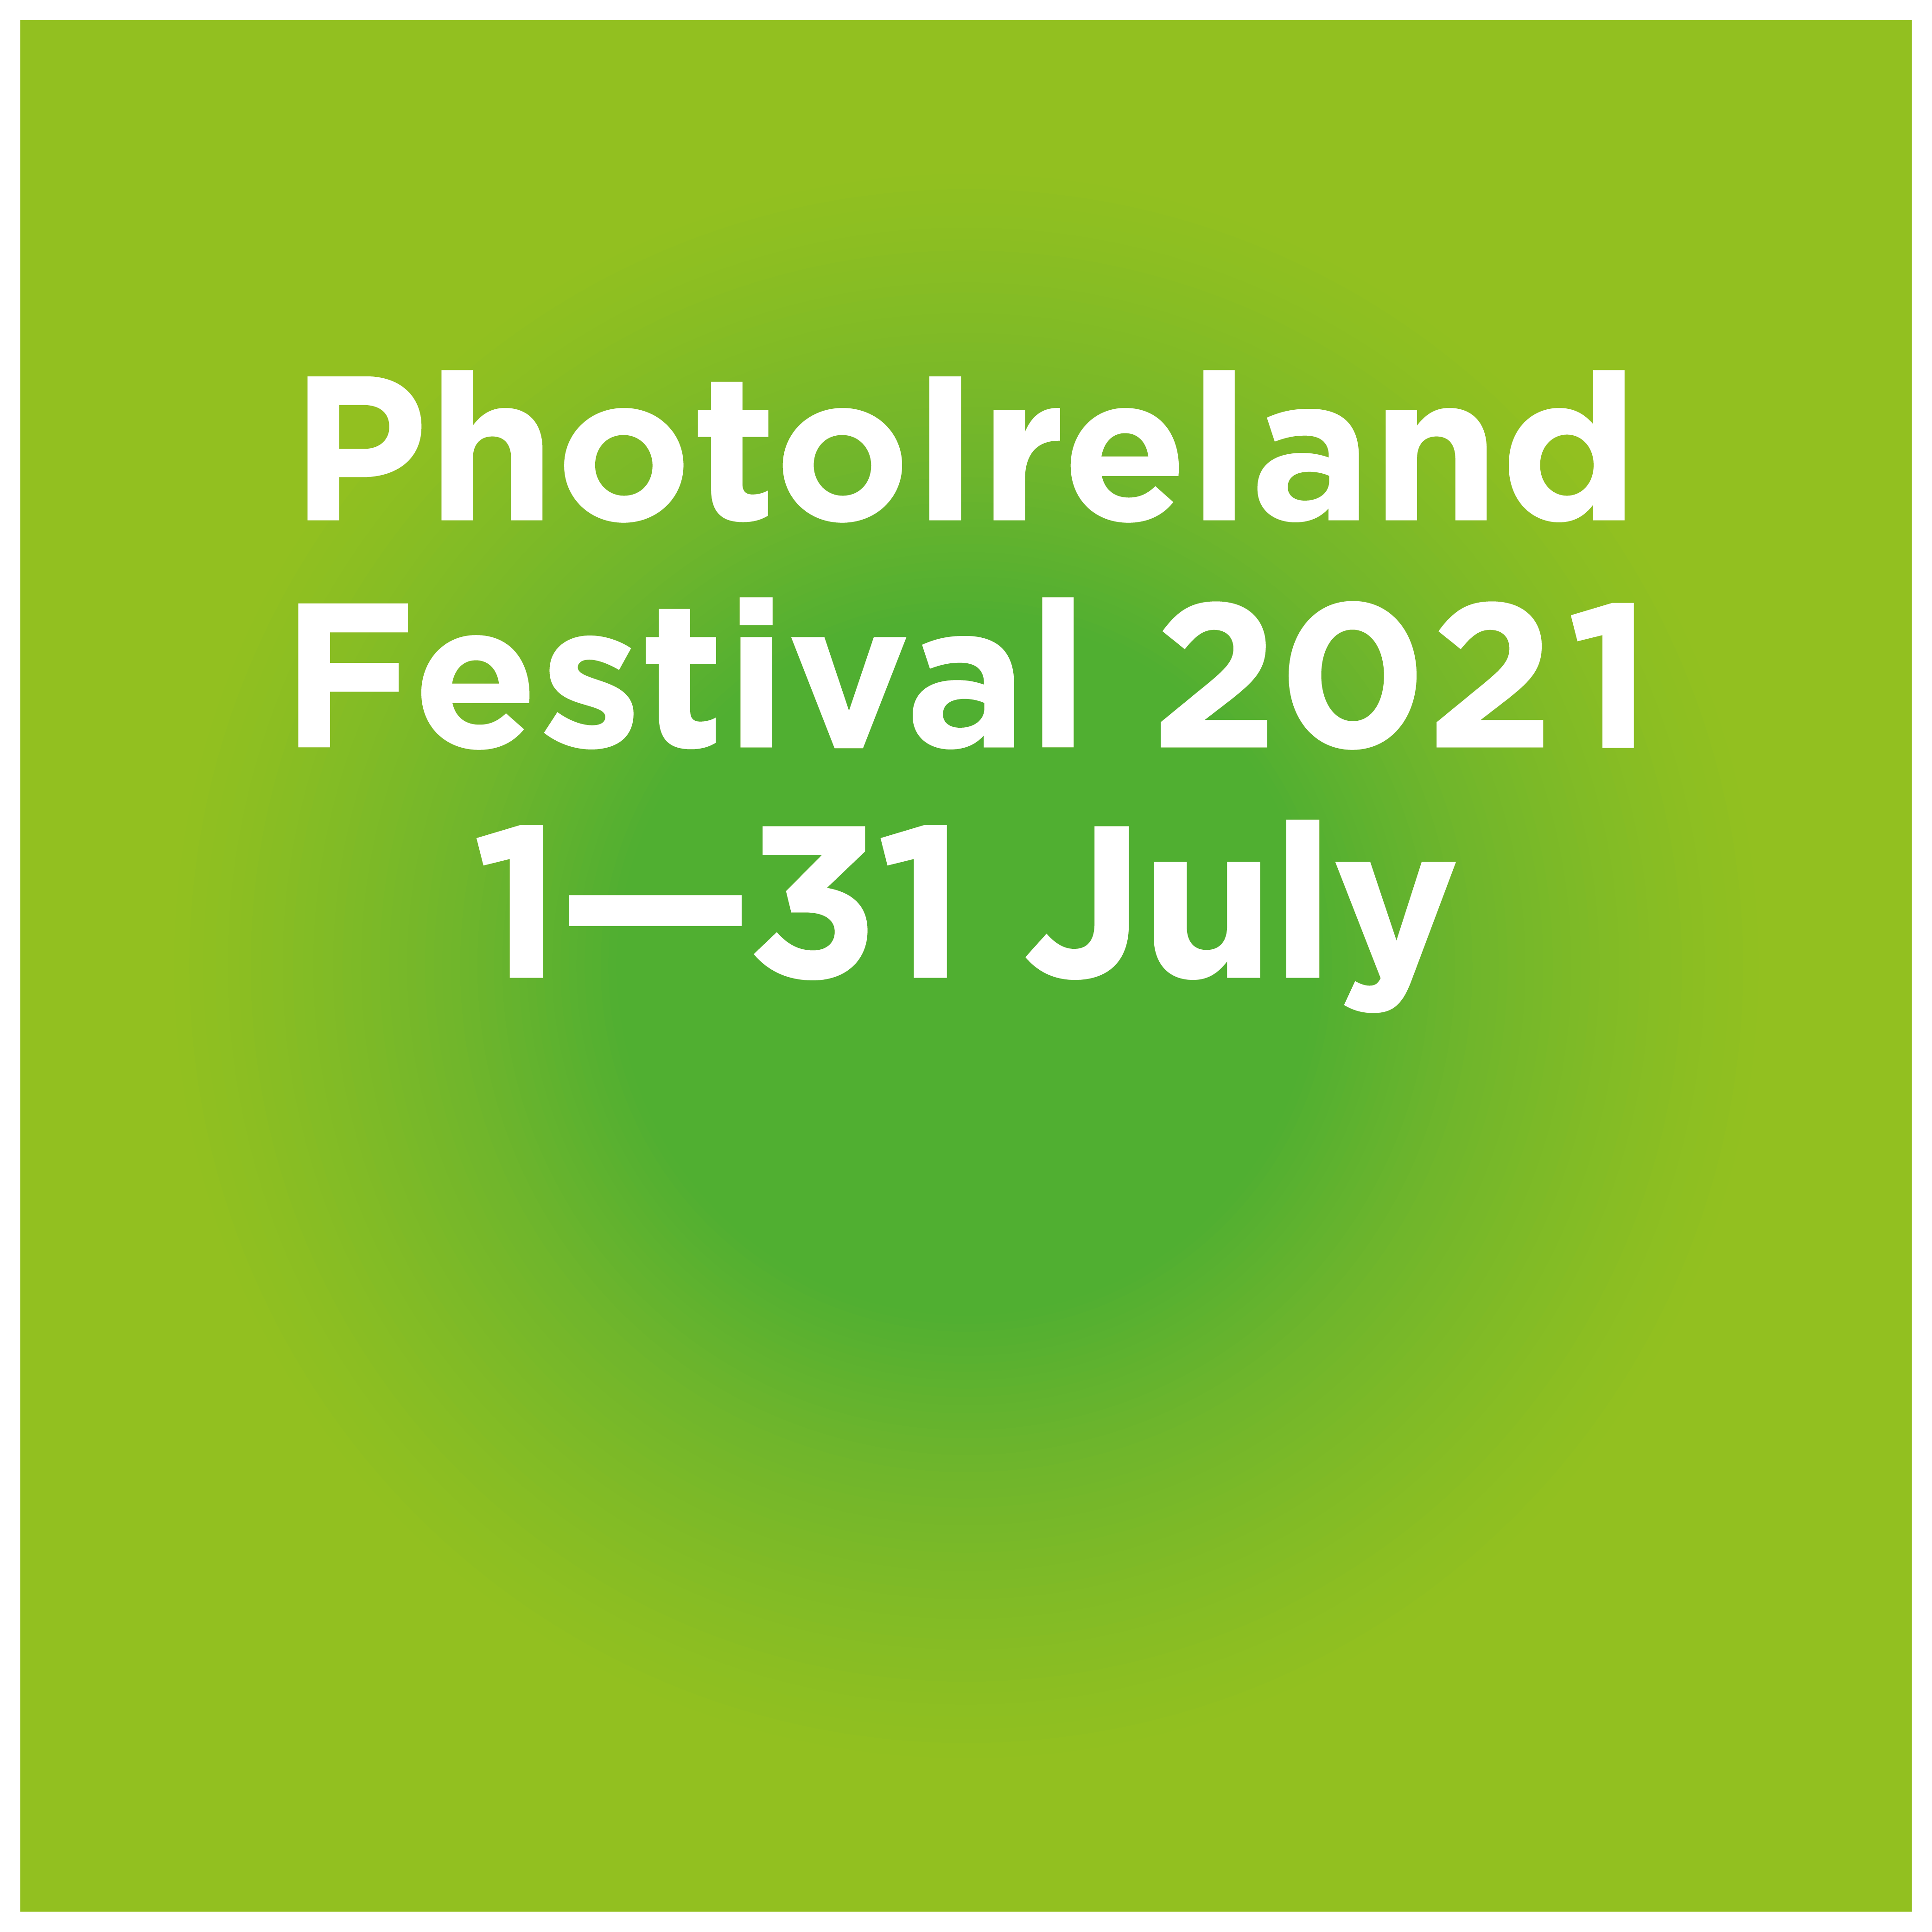 PhotoIreland Festival 2021